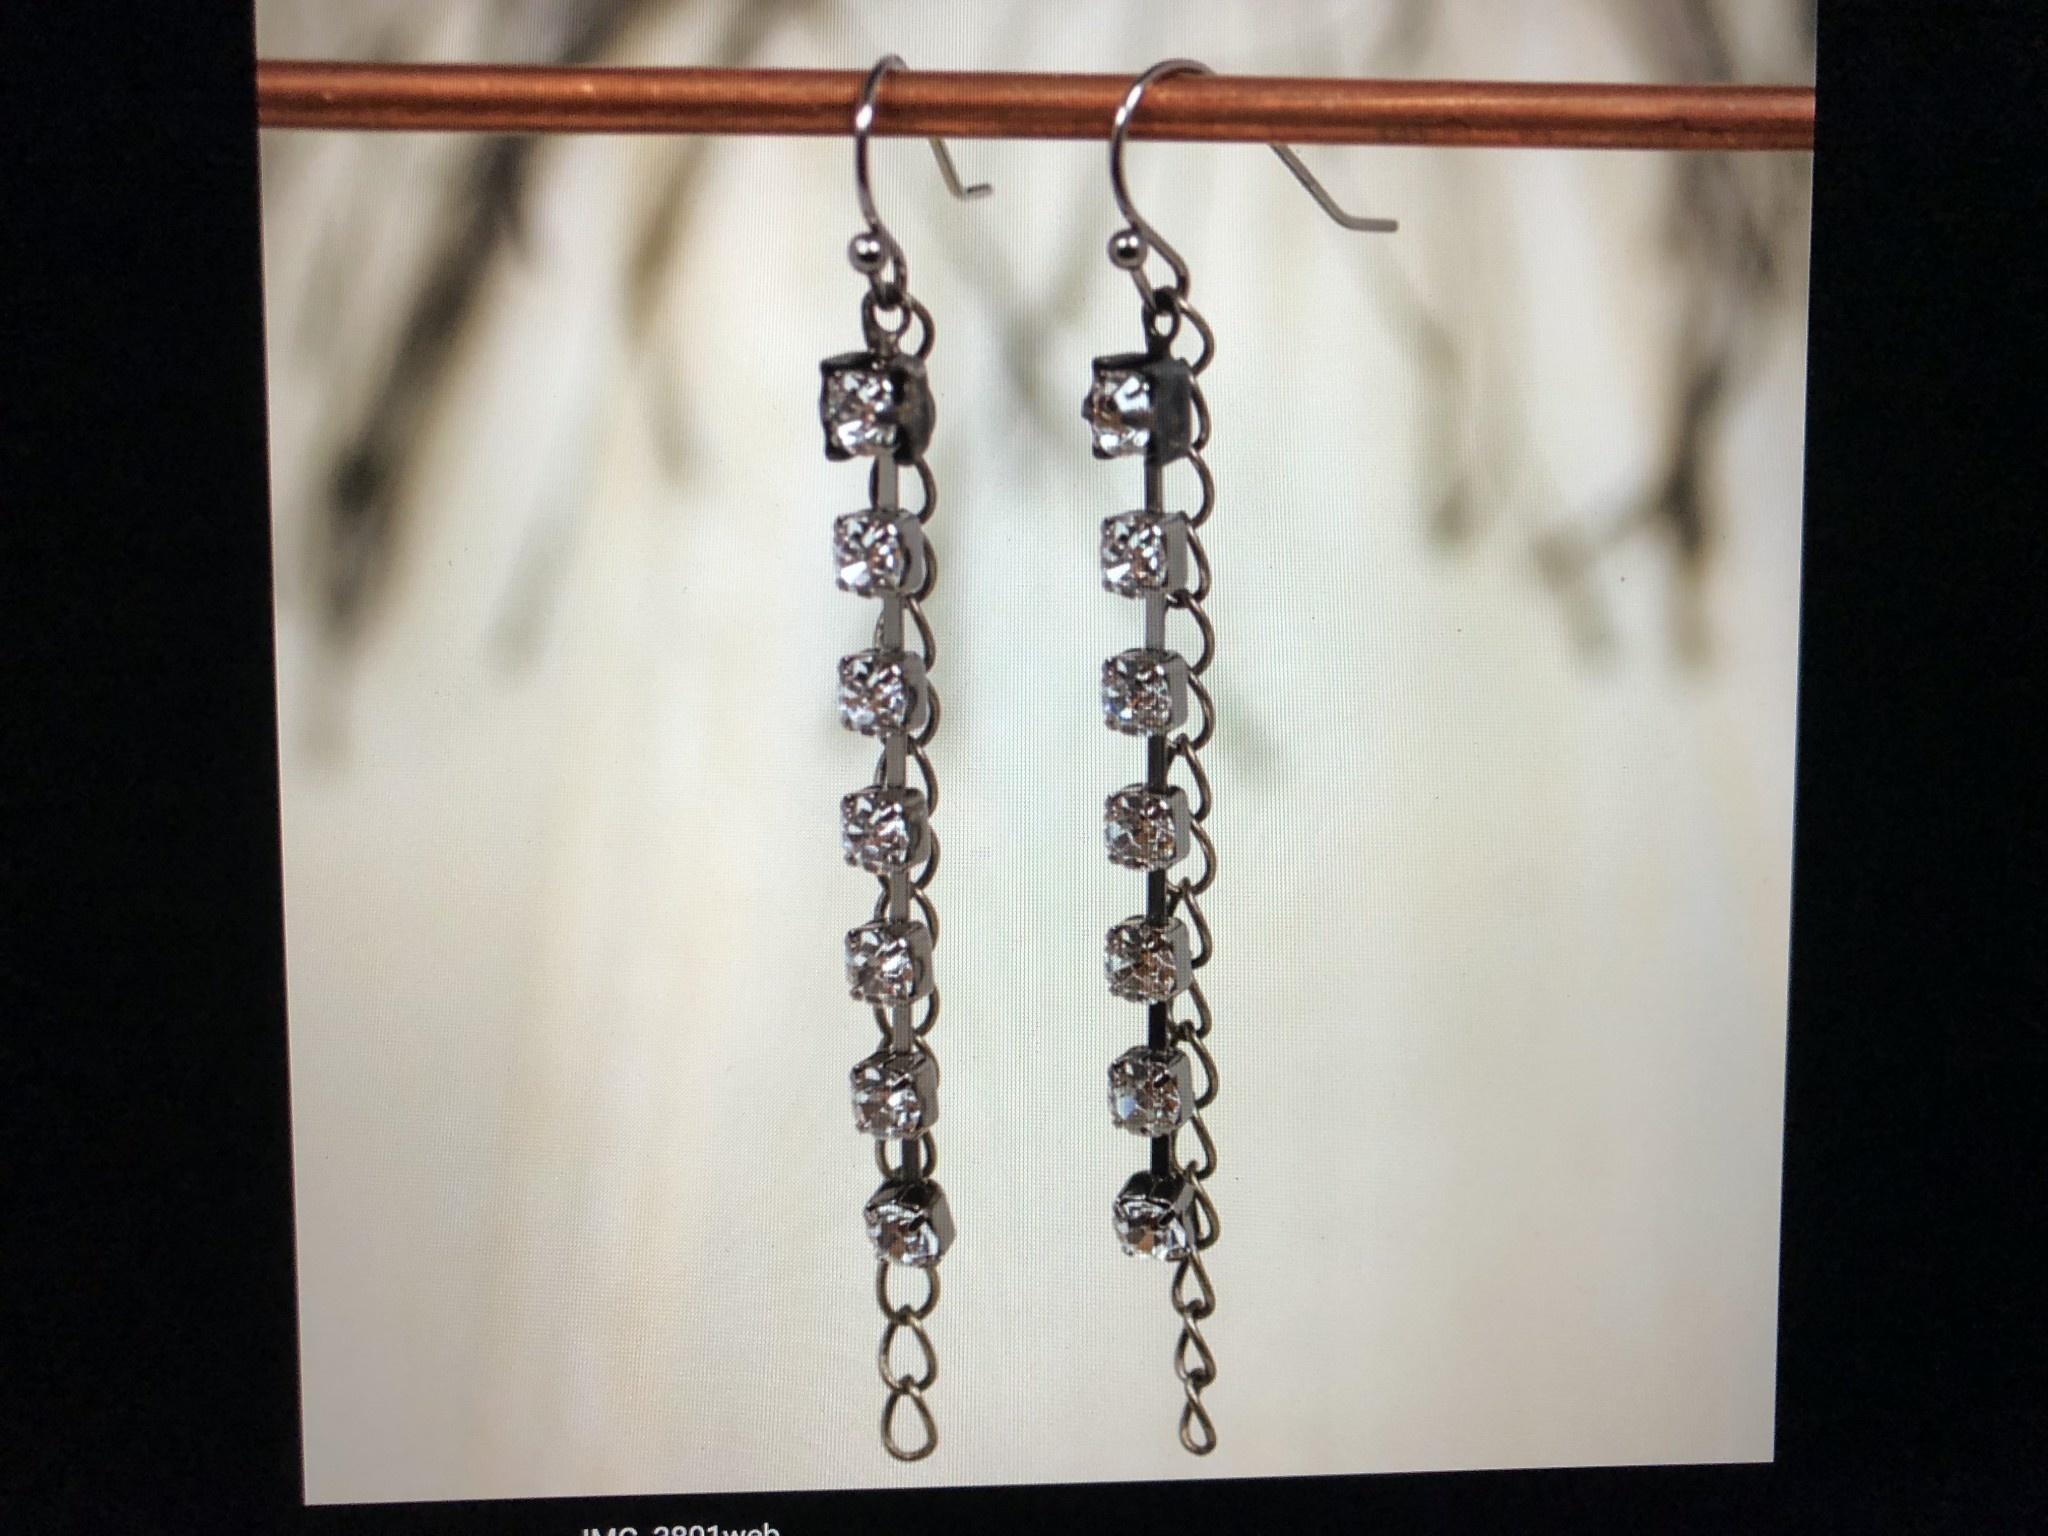 cool water jewelry EW447-50 Rhinestone/Curb Chain Drop